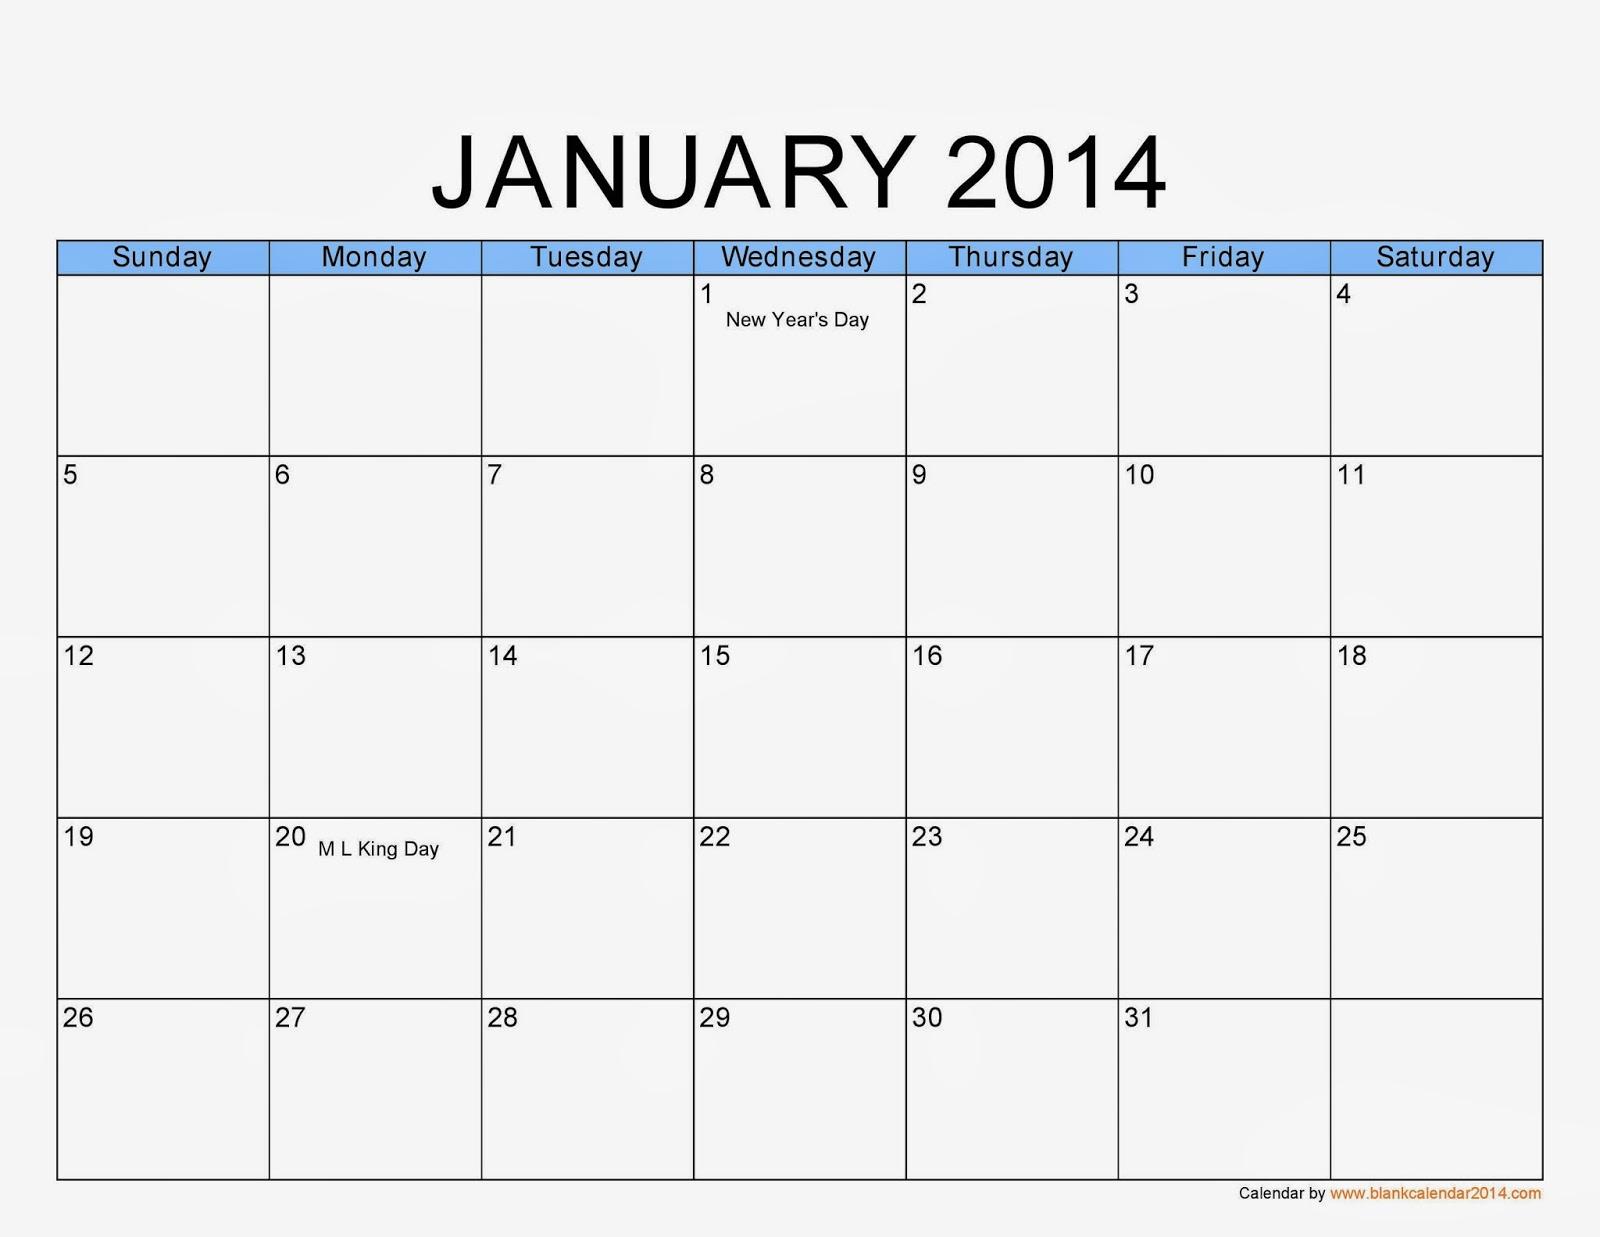 January 2014 Calendar Printable #1 - Printable Calendar 2014, Blank